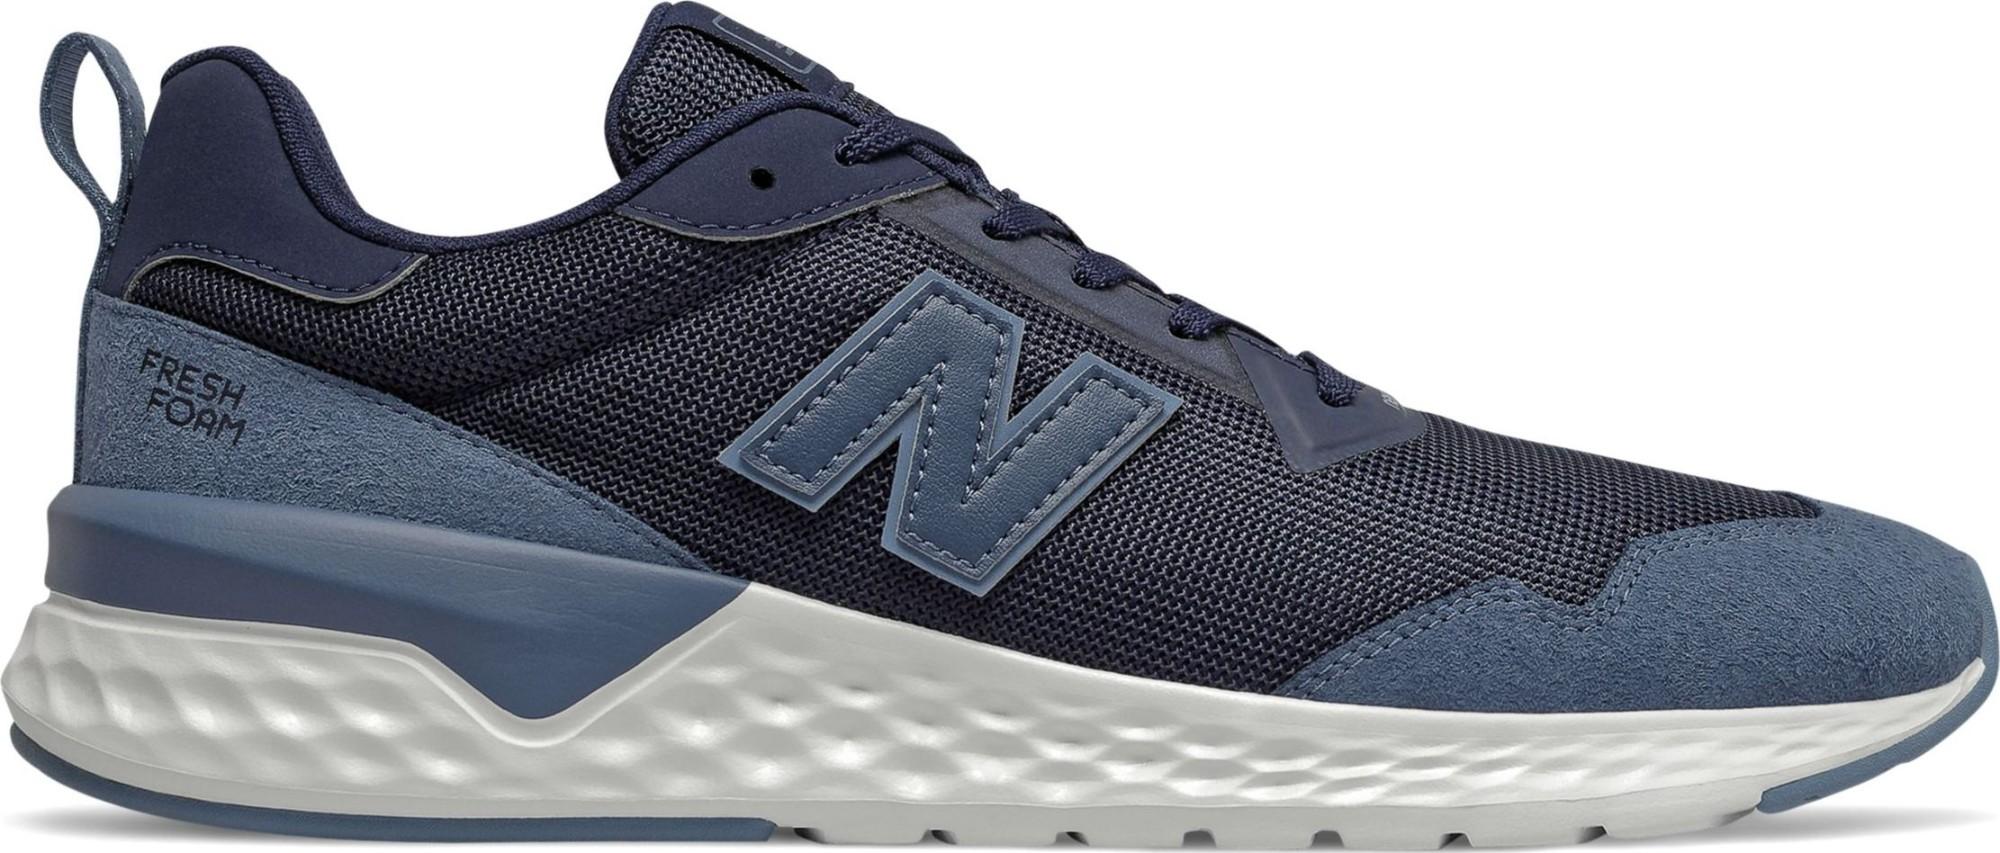 New Balance MS515 Navy 45